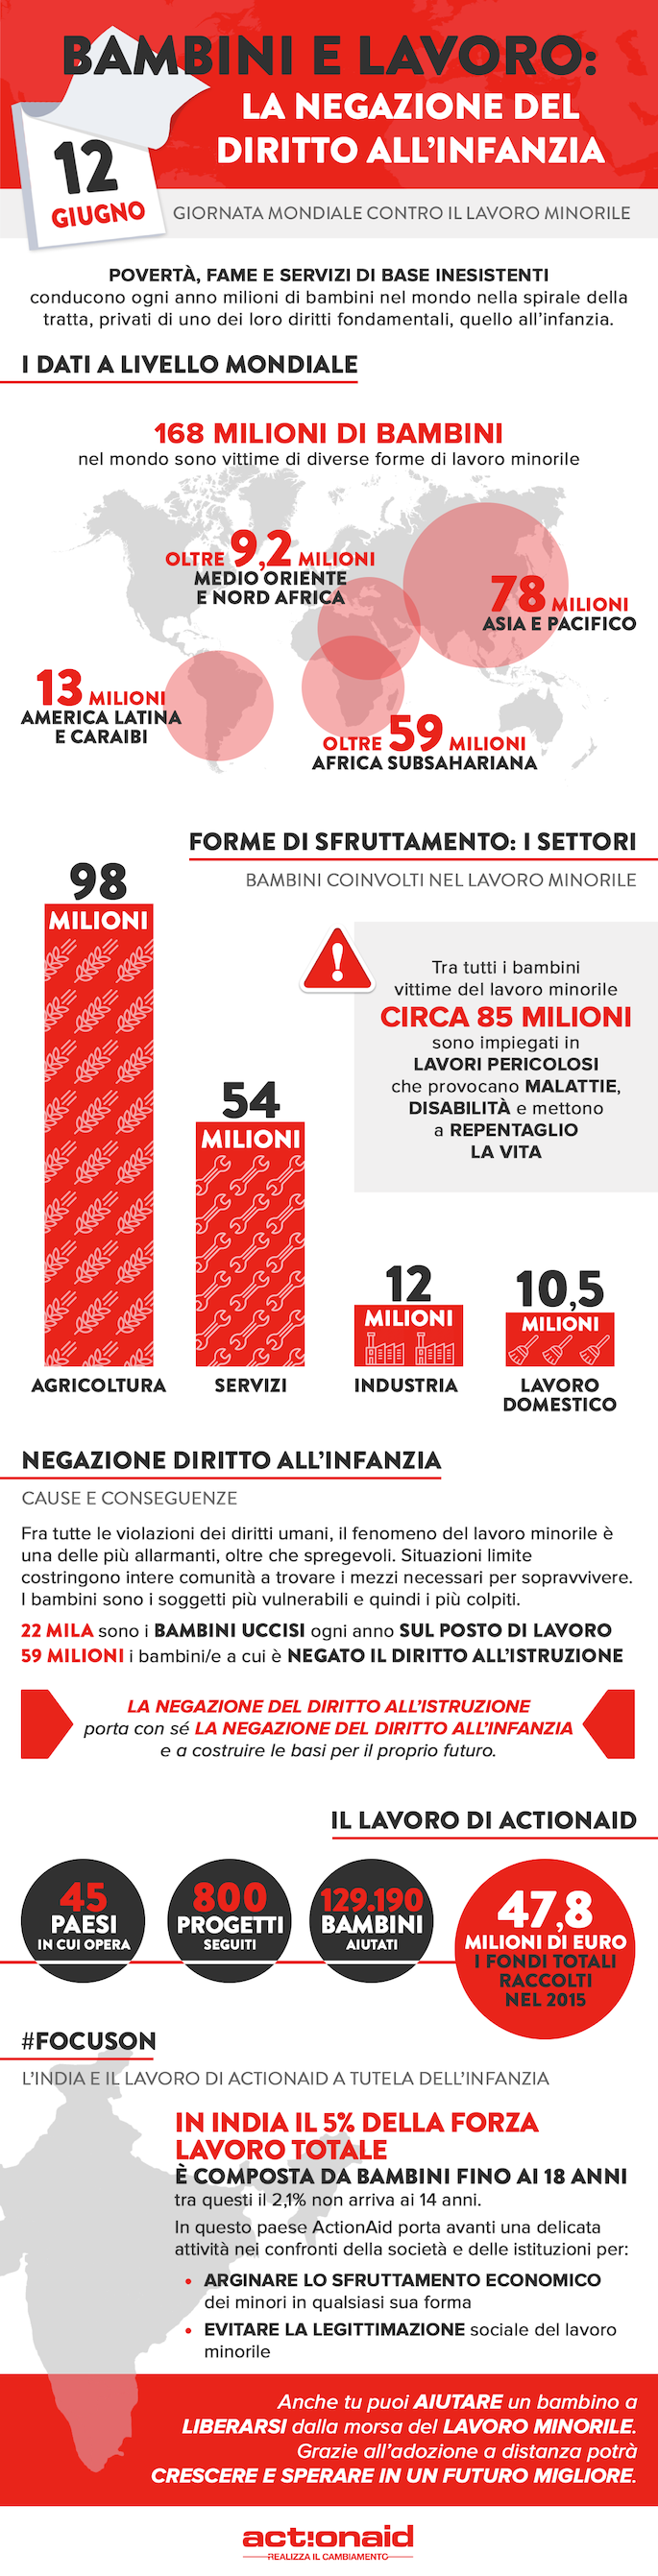 20170530_actionaid_lavro_minorile_infografica